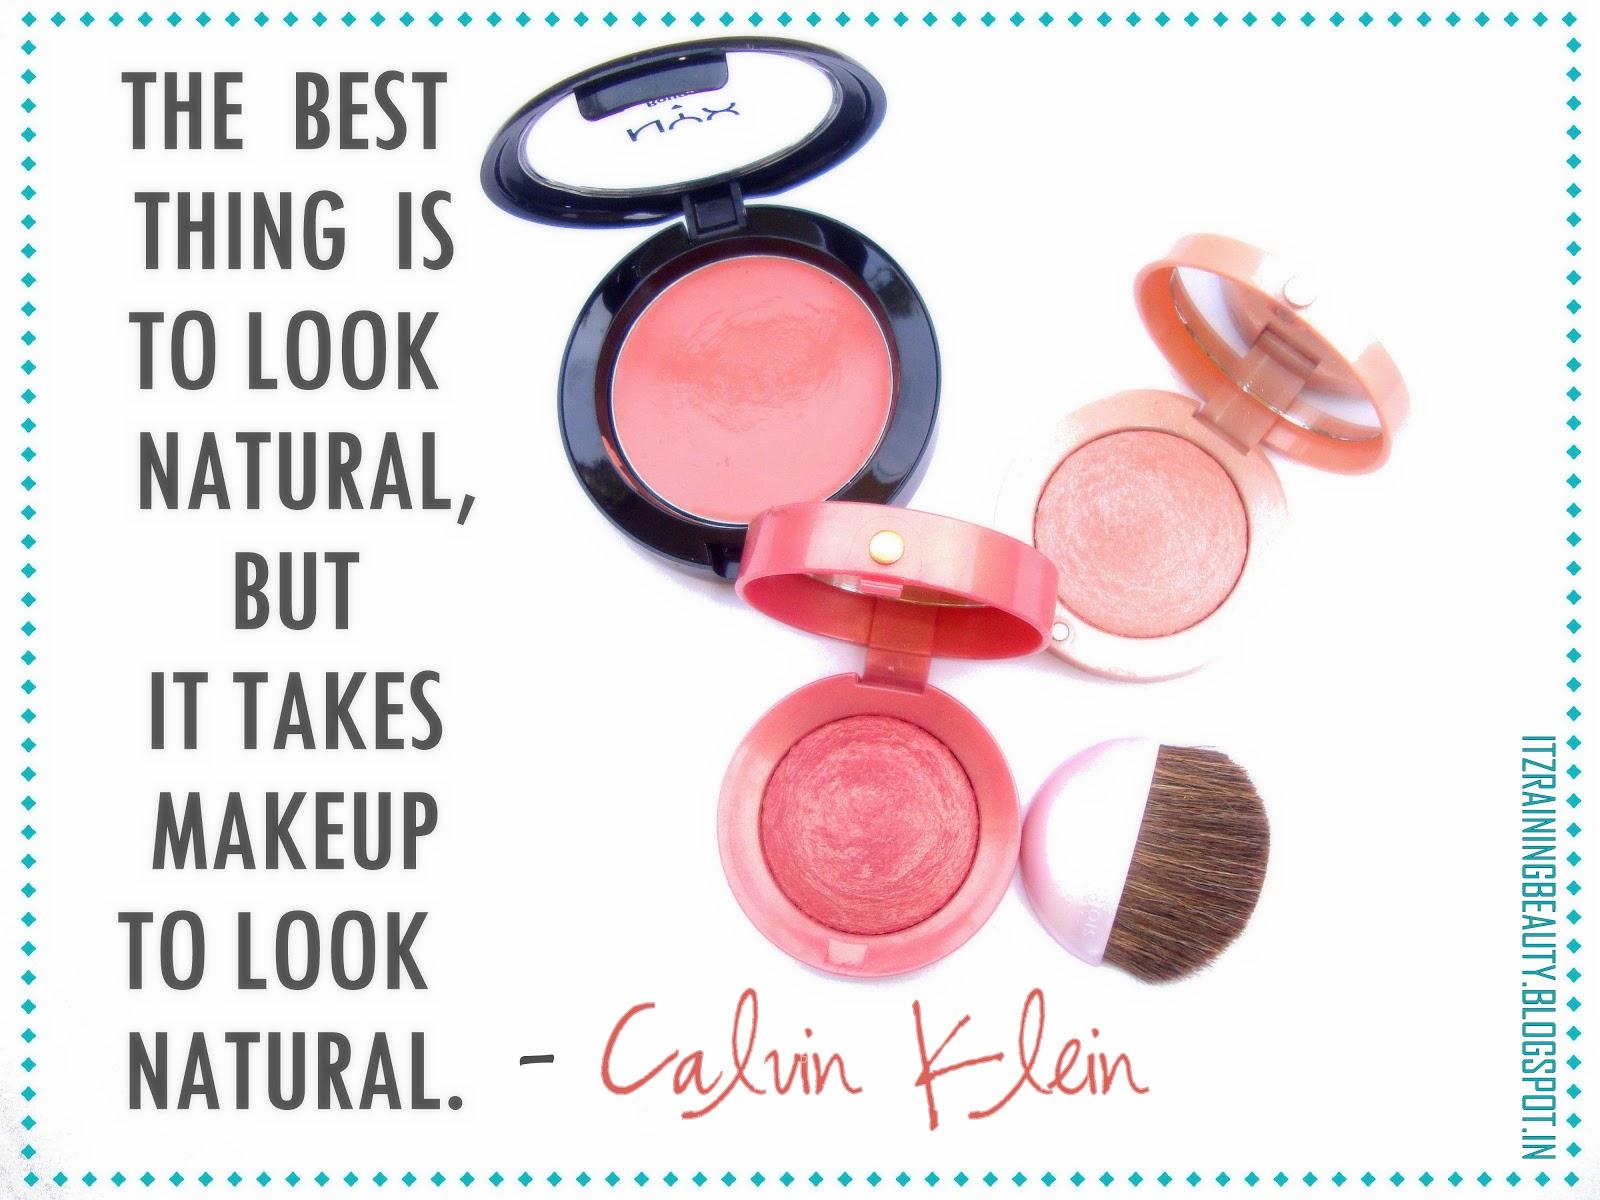 Makeup quote #4